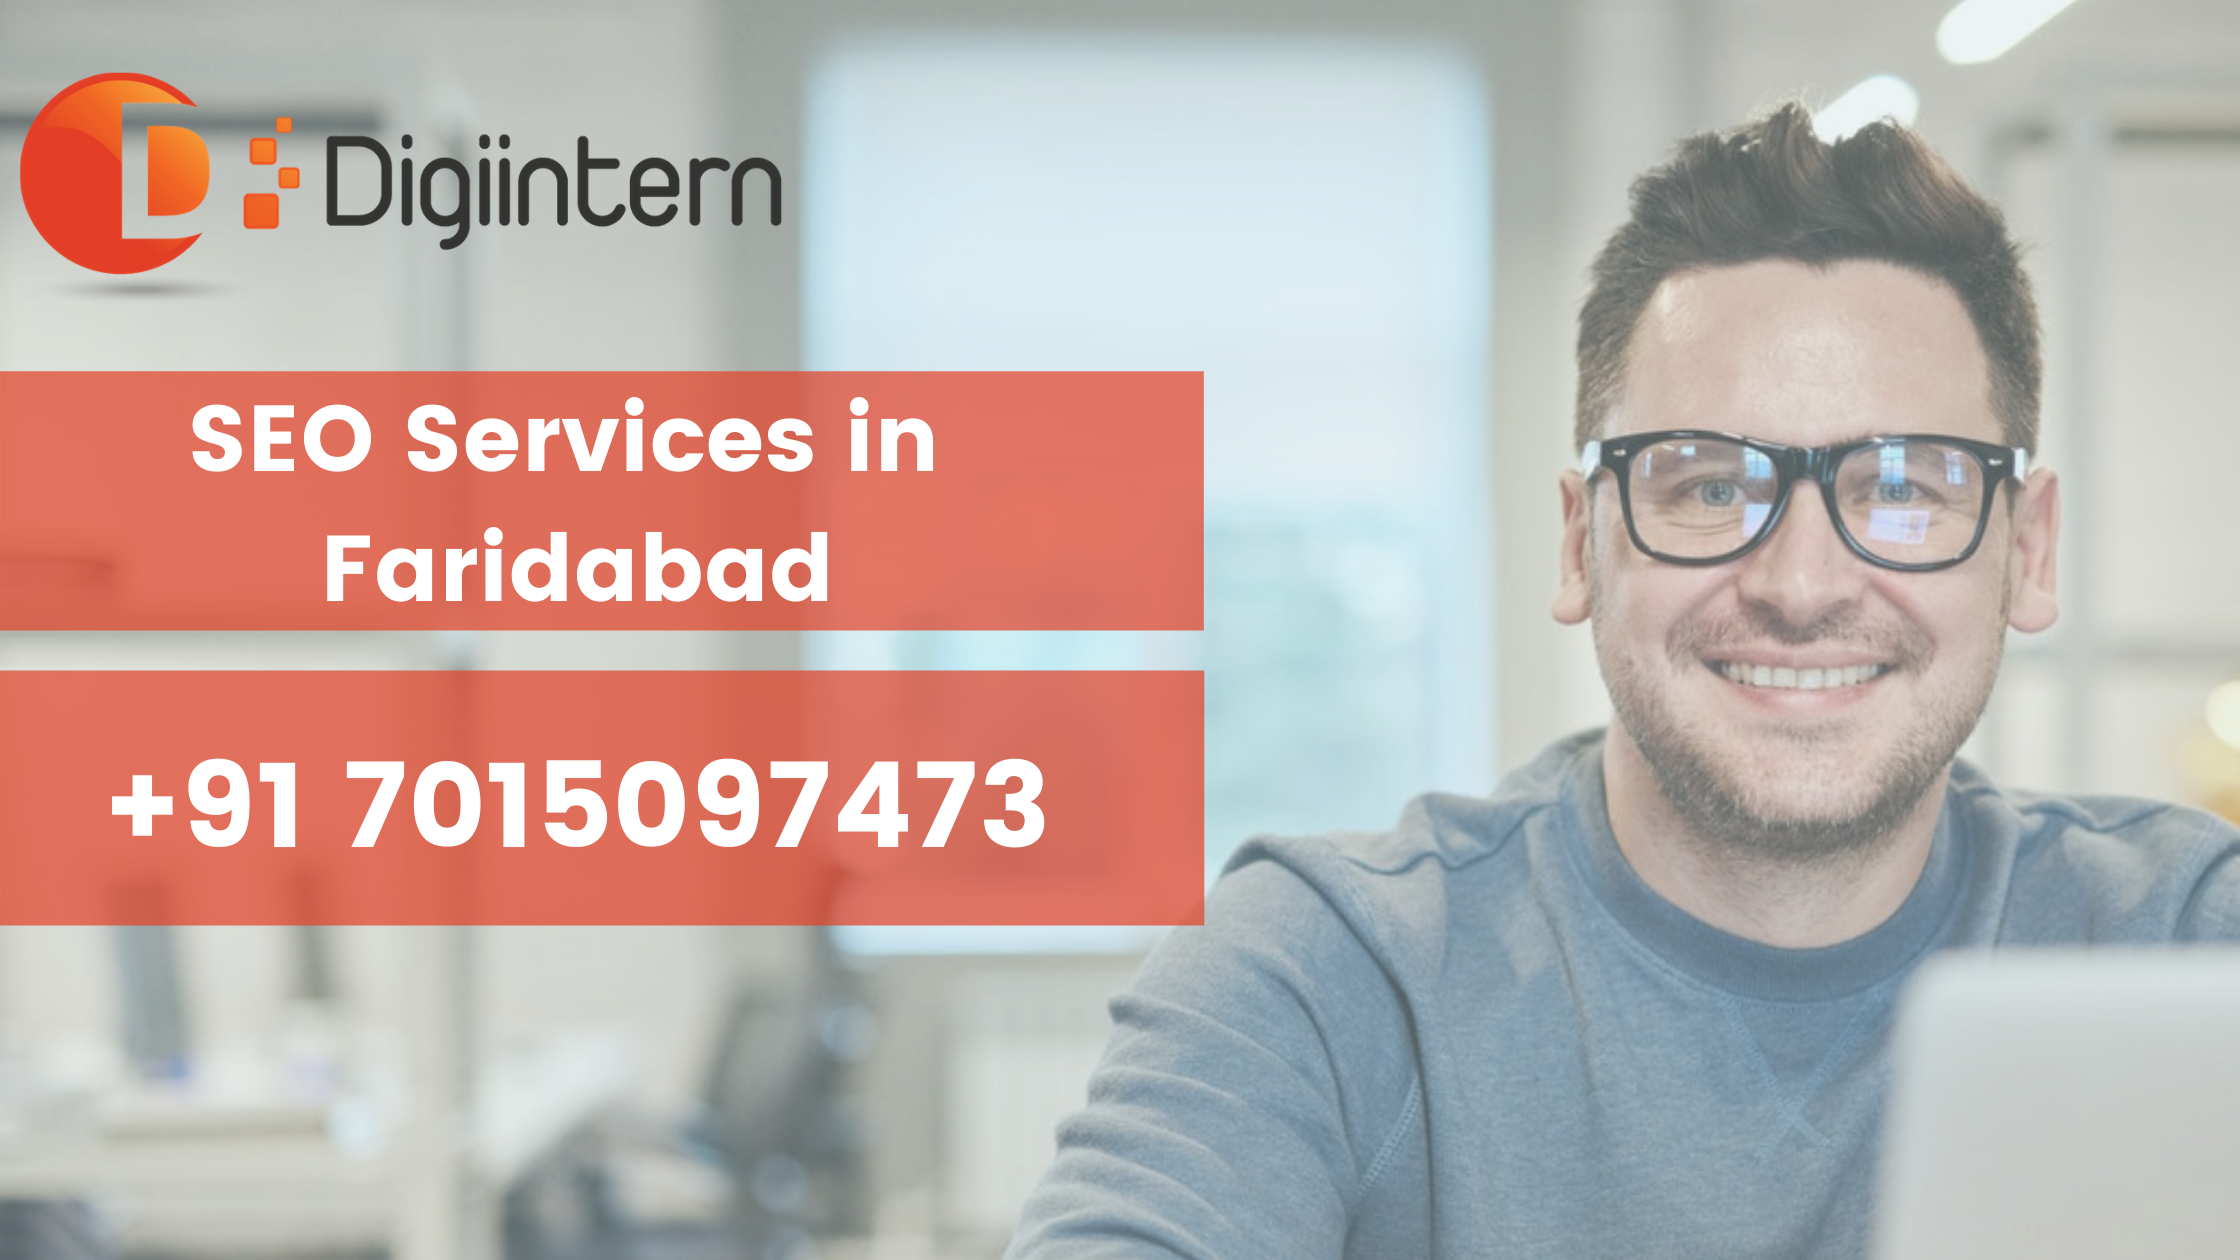 SEO Services in Faridabad